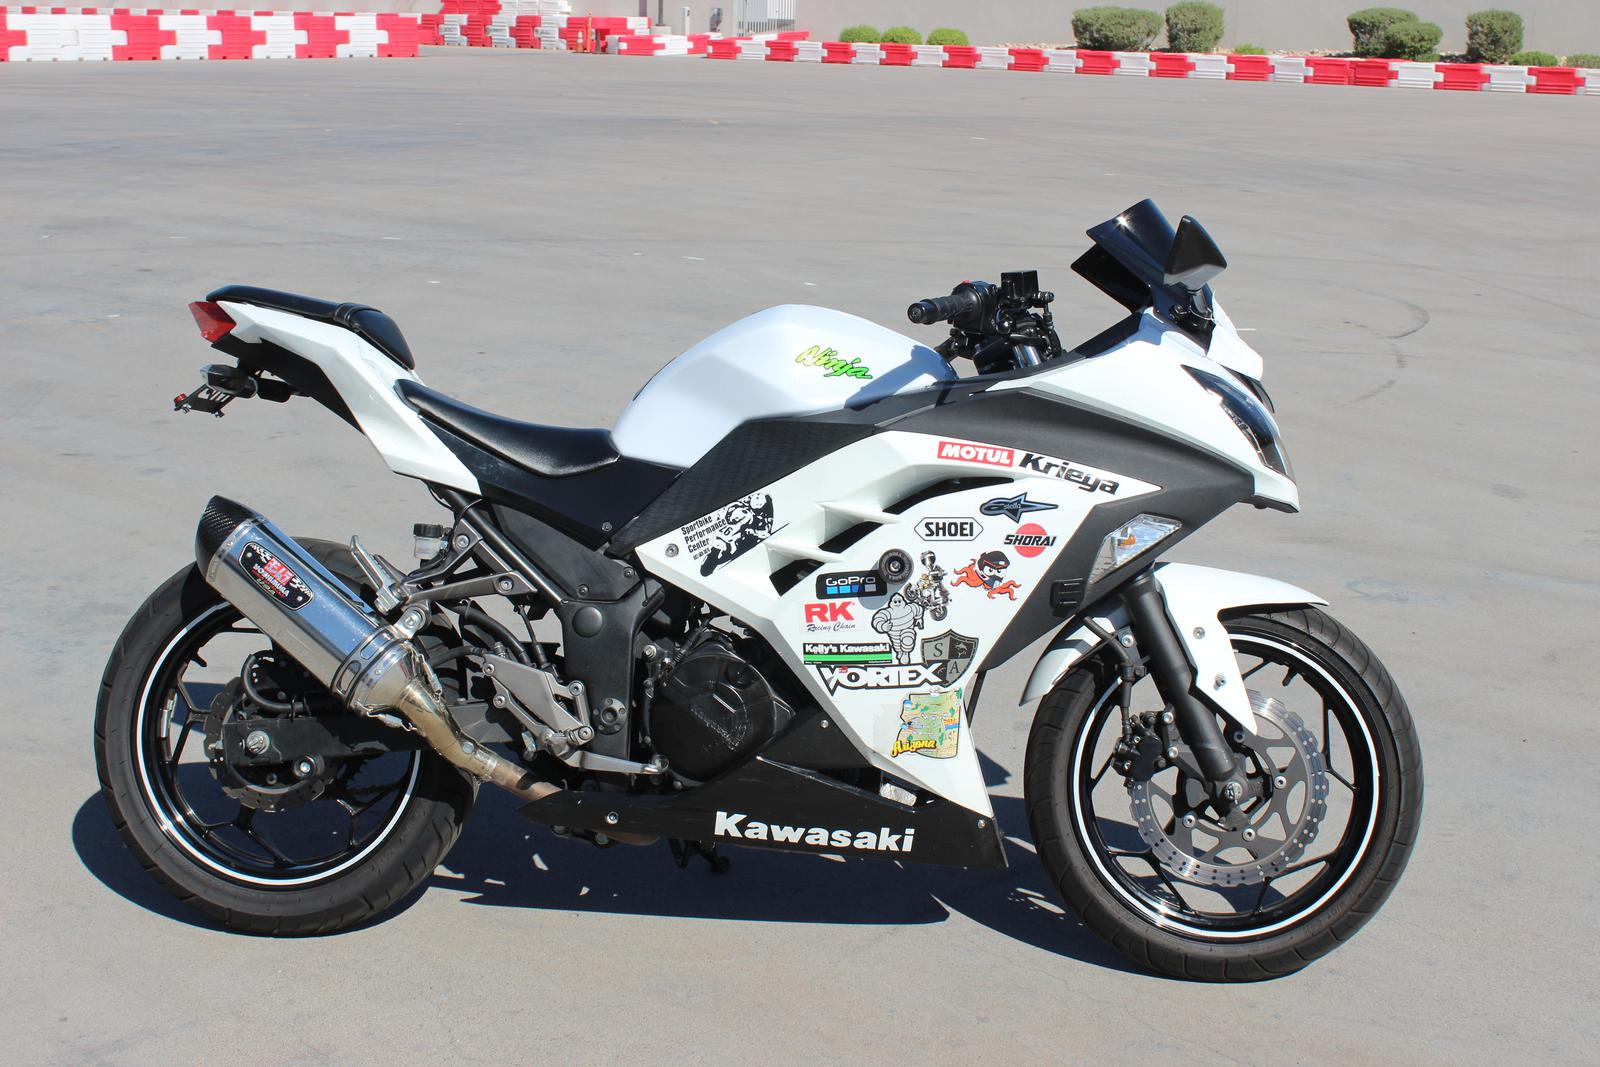 2015 Kawasaki Ninja 300 For Sale In Scottsdale Az Go Az